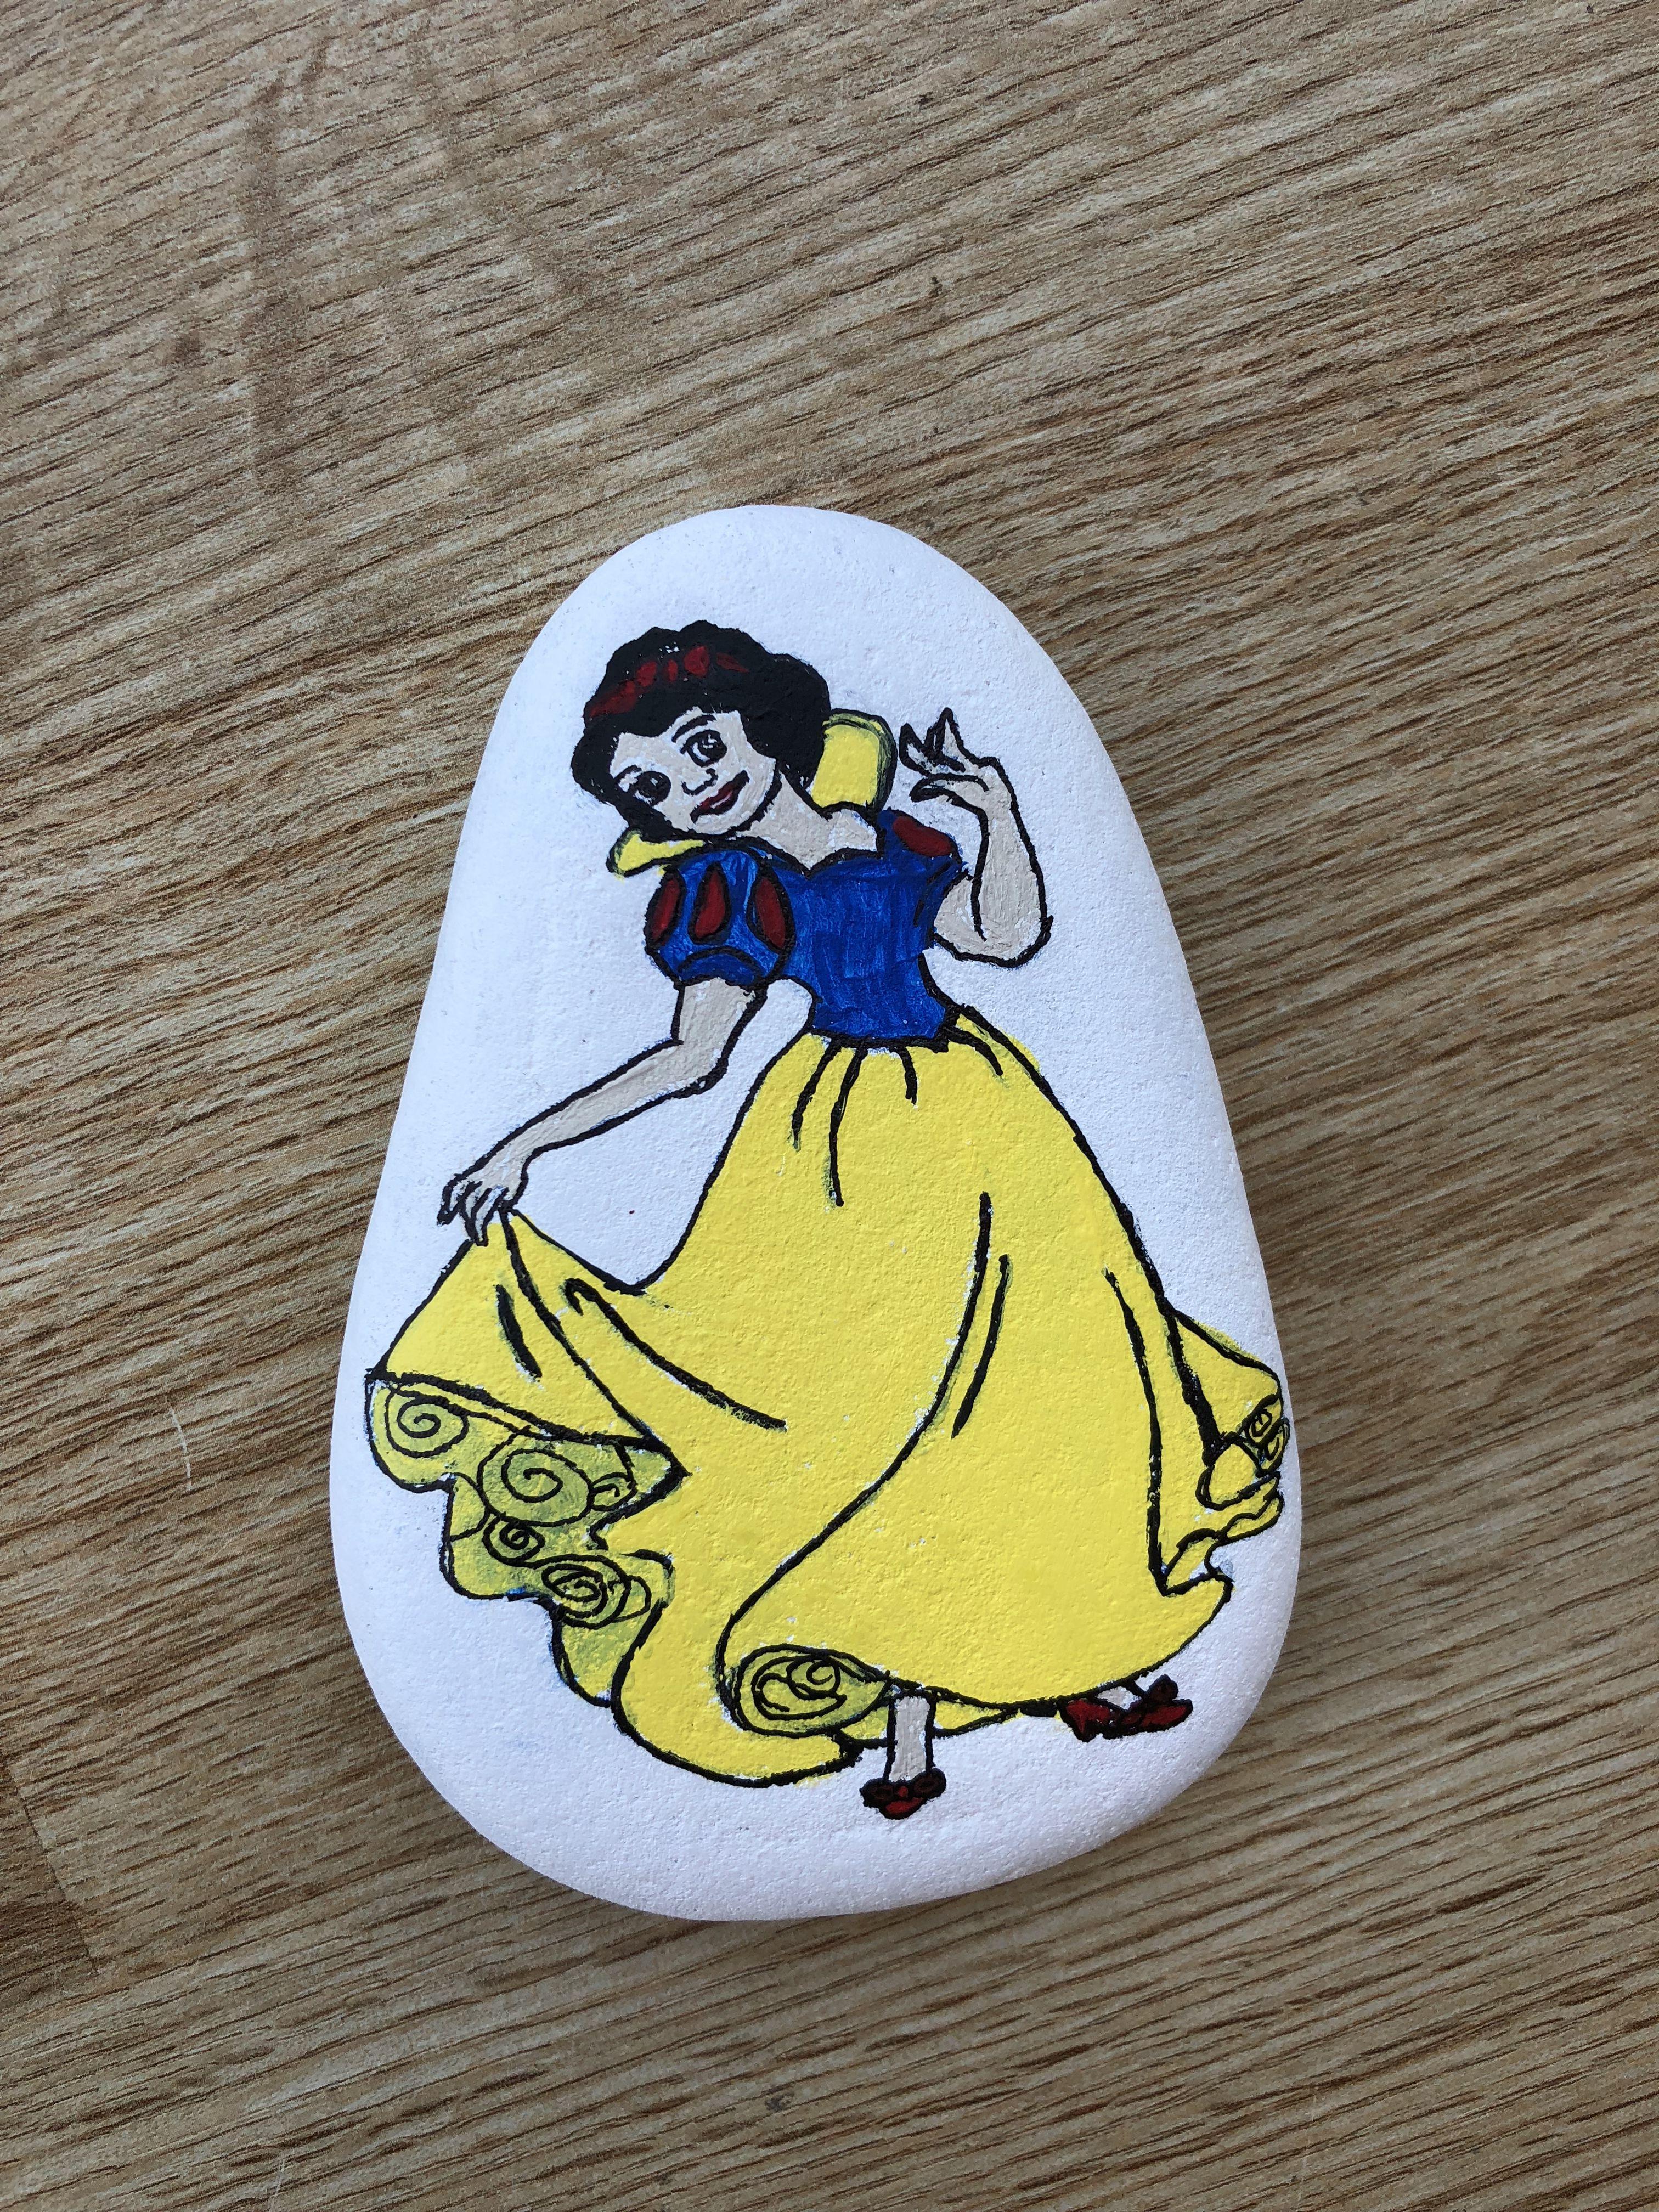 Tasboyama Stonepainting Pamukprenses Prenses Princess